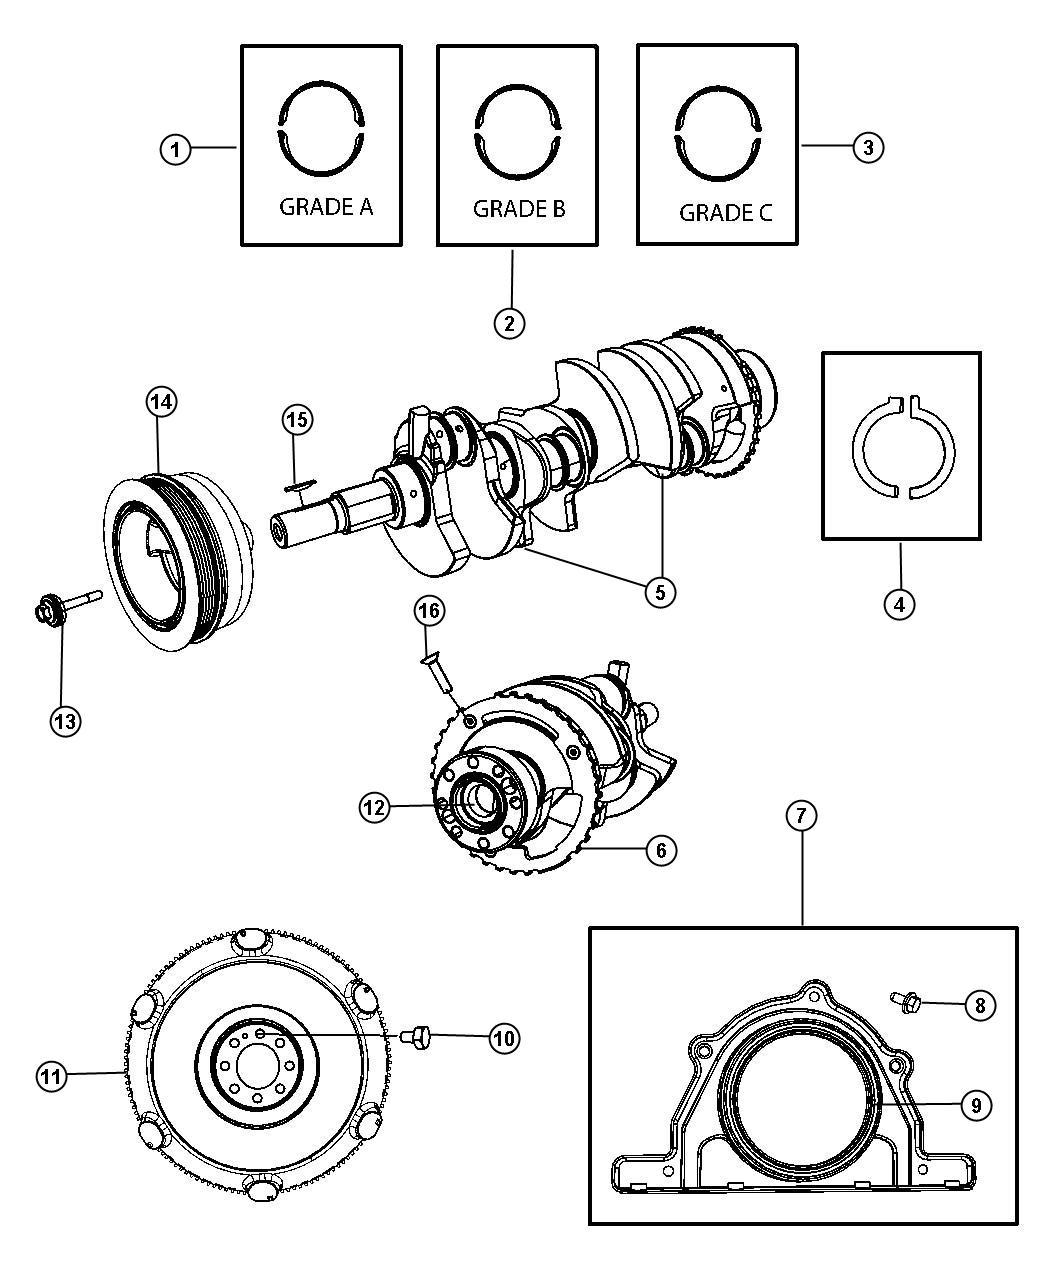 2010 Dodge Challenger Flywheel. Mounting. Manual